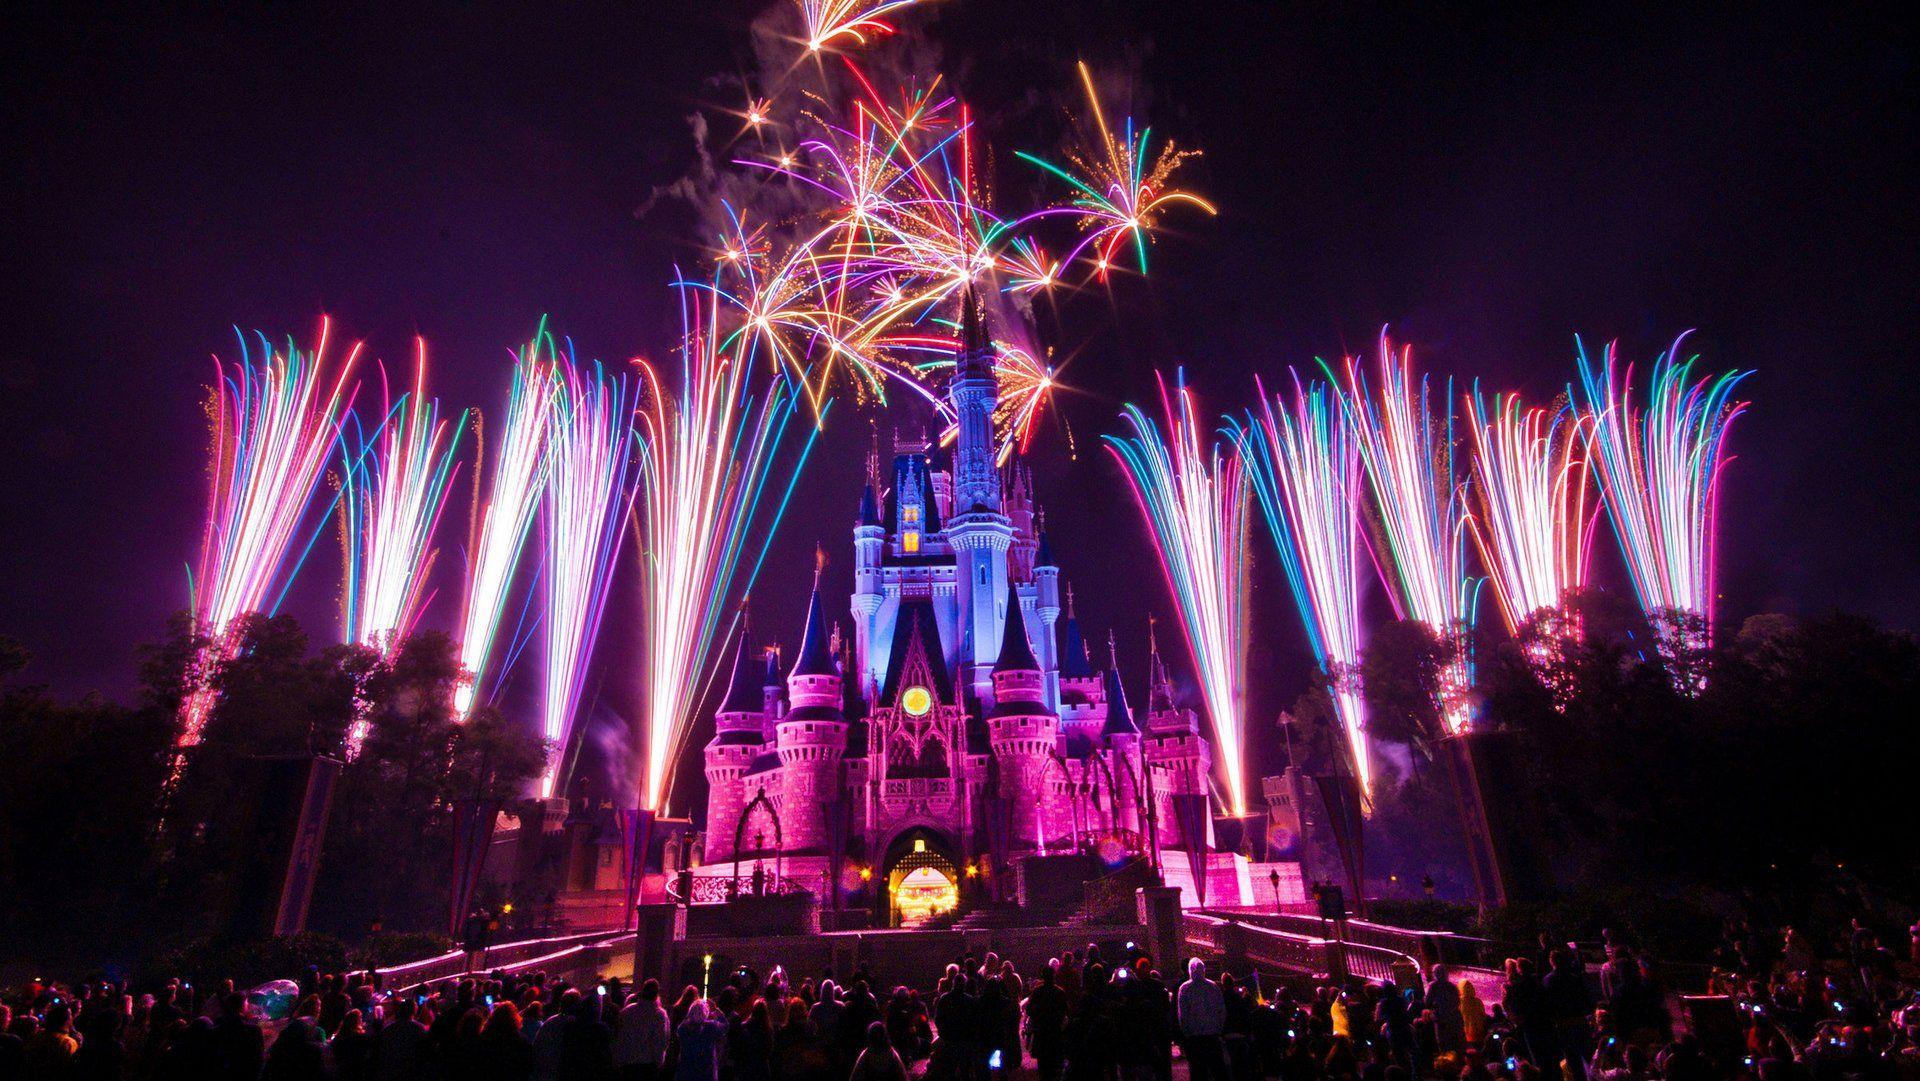 Disney Land Fireworks Photo Hd Wallpaper Fireworks Photo Fireworks Wallpaper Hd Wallpaper